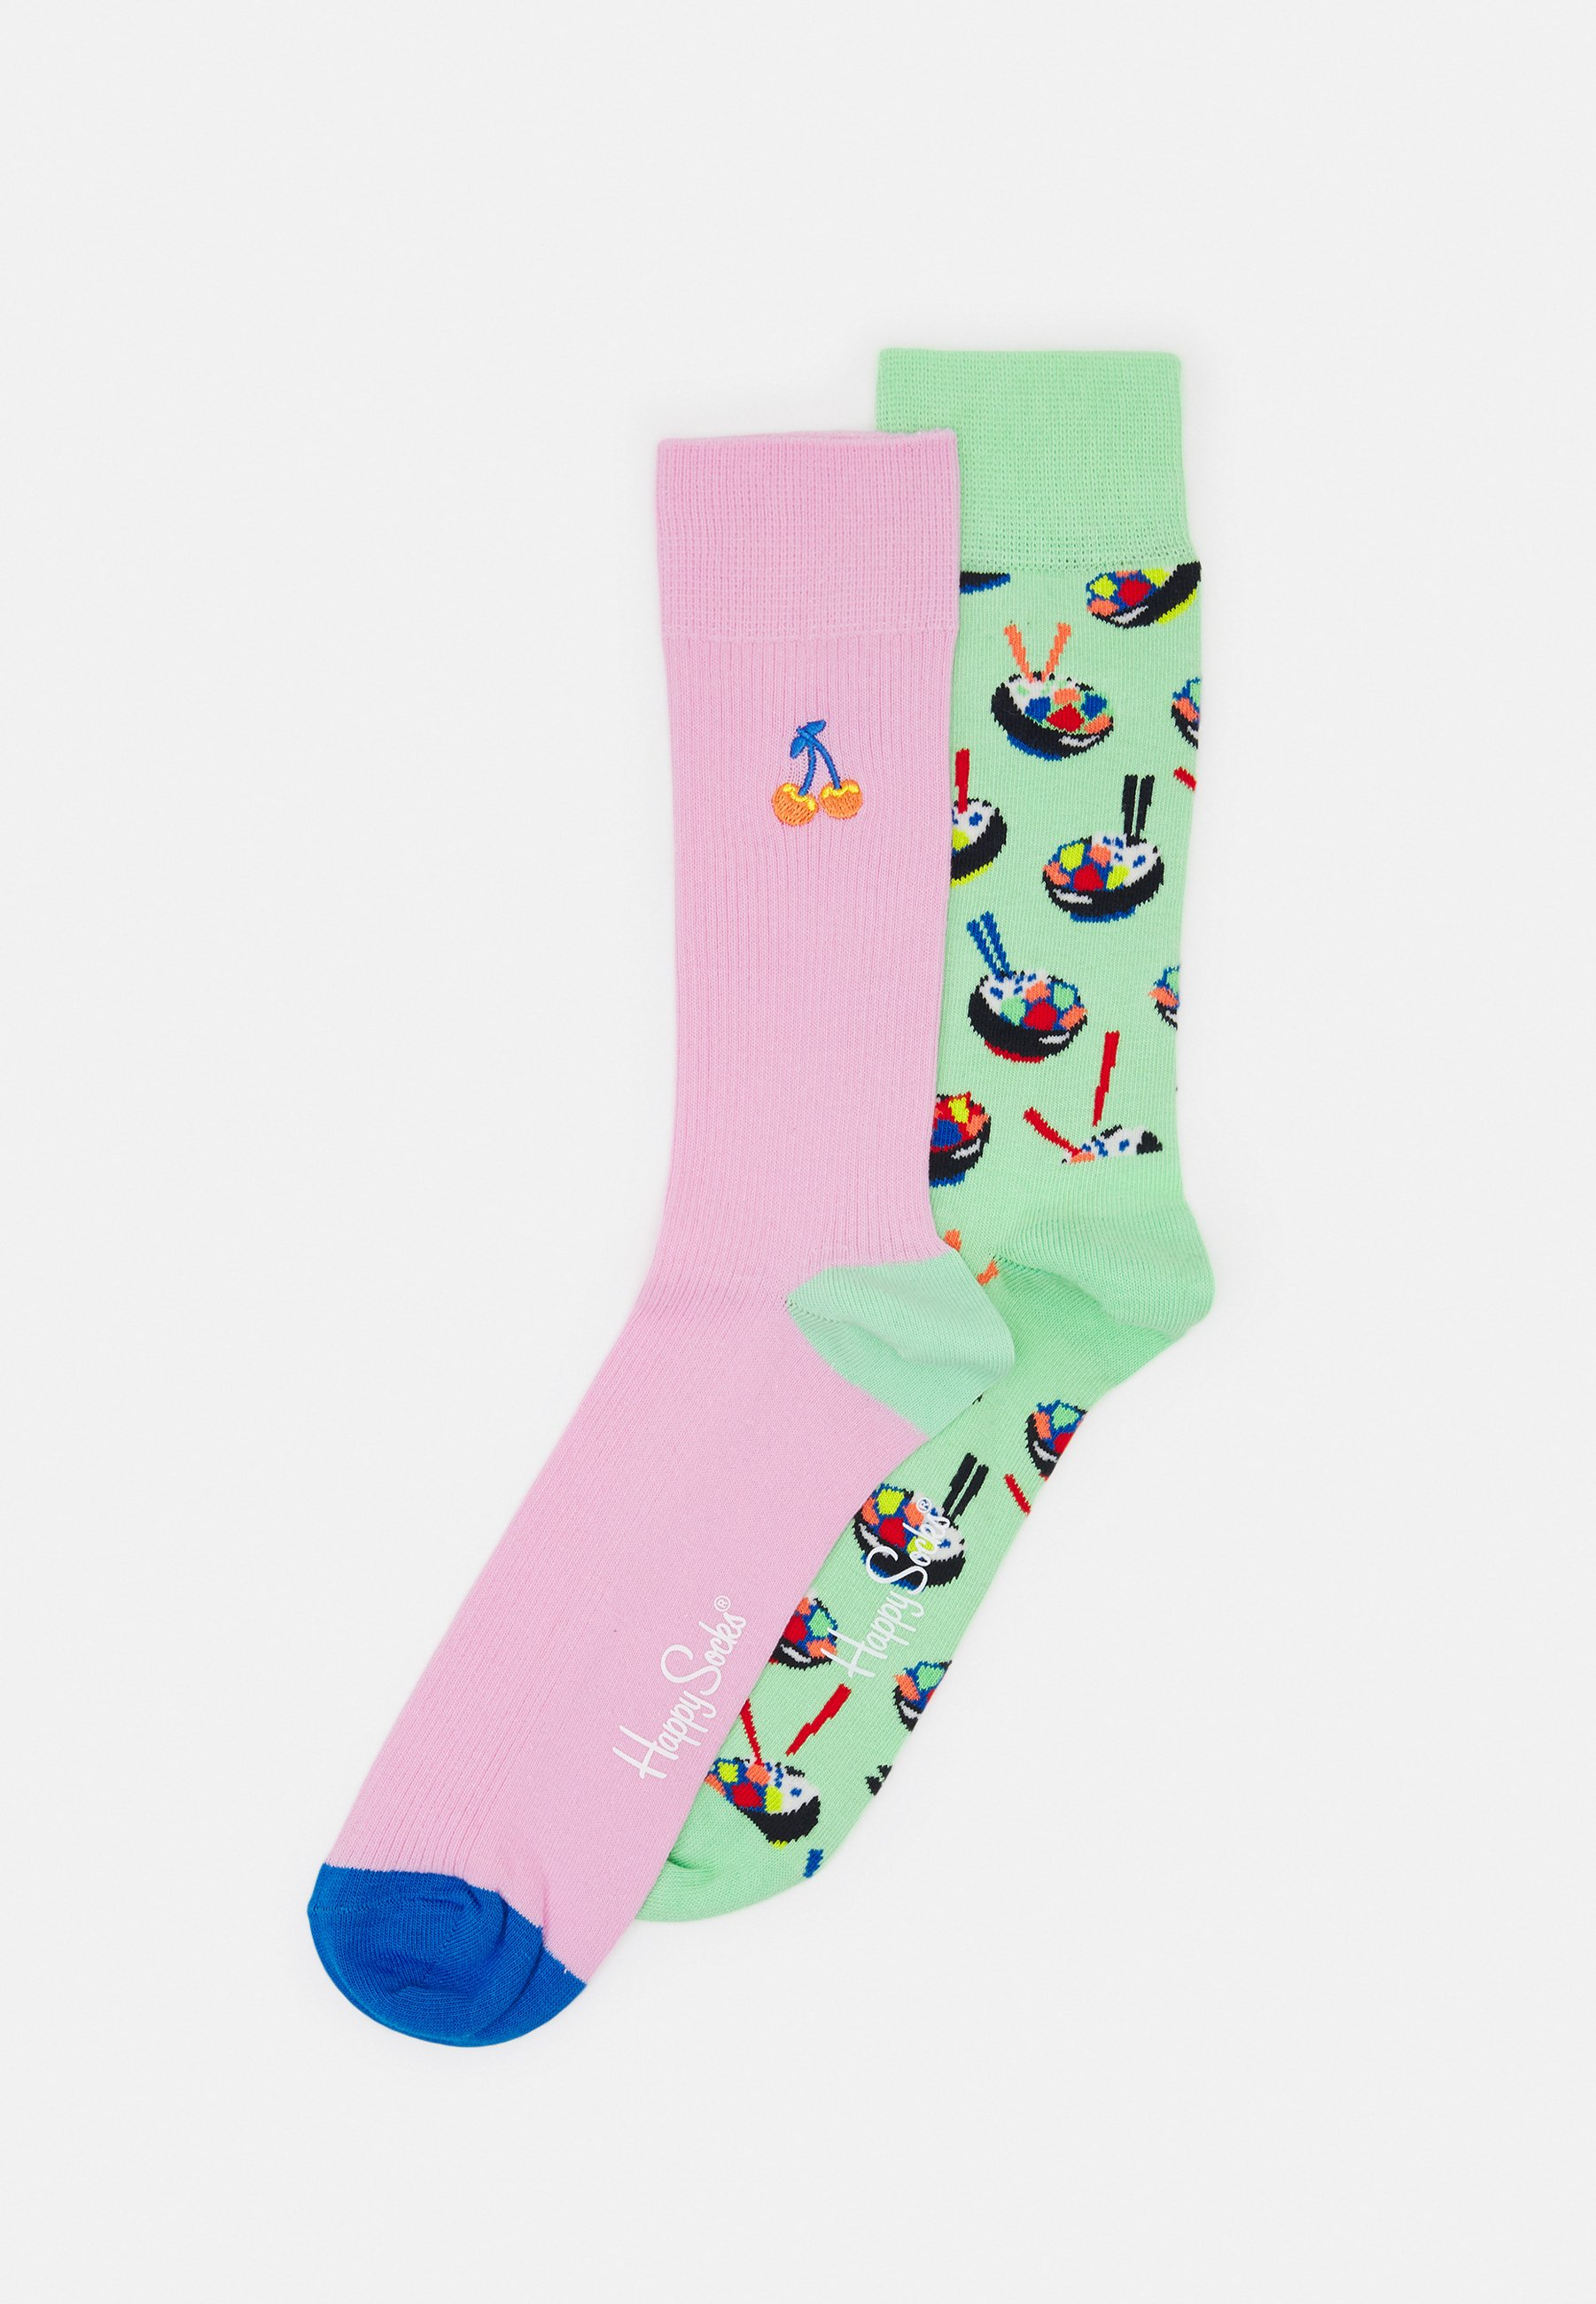 Women POKÉ BOWL SOCK EMBROIDERY CHERRY SOCK UNISEX 2 PACK - Socks